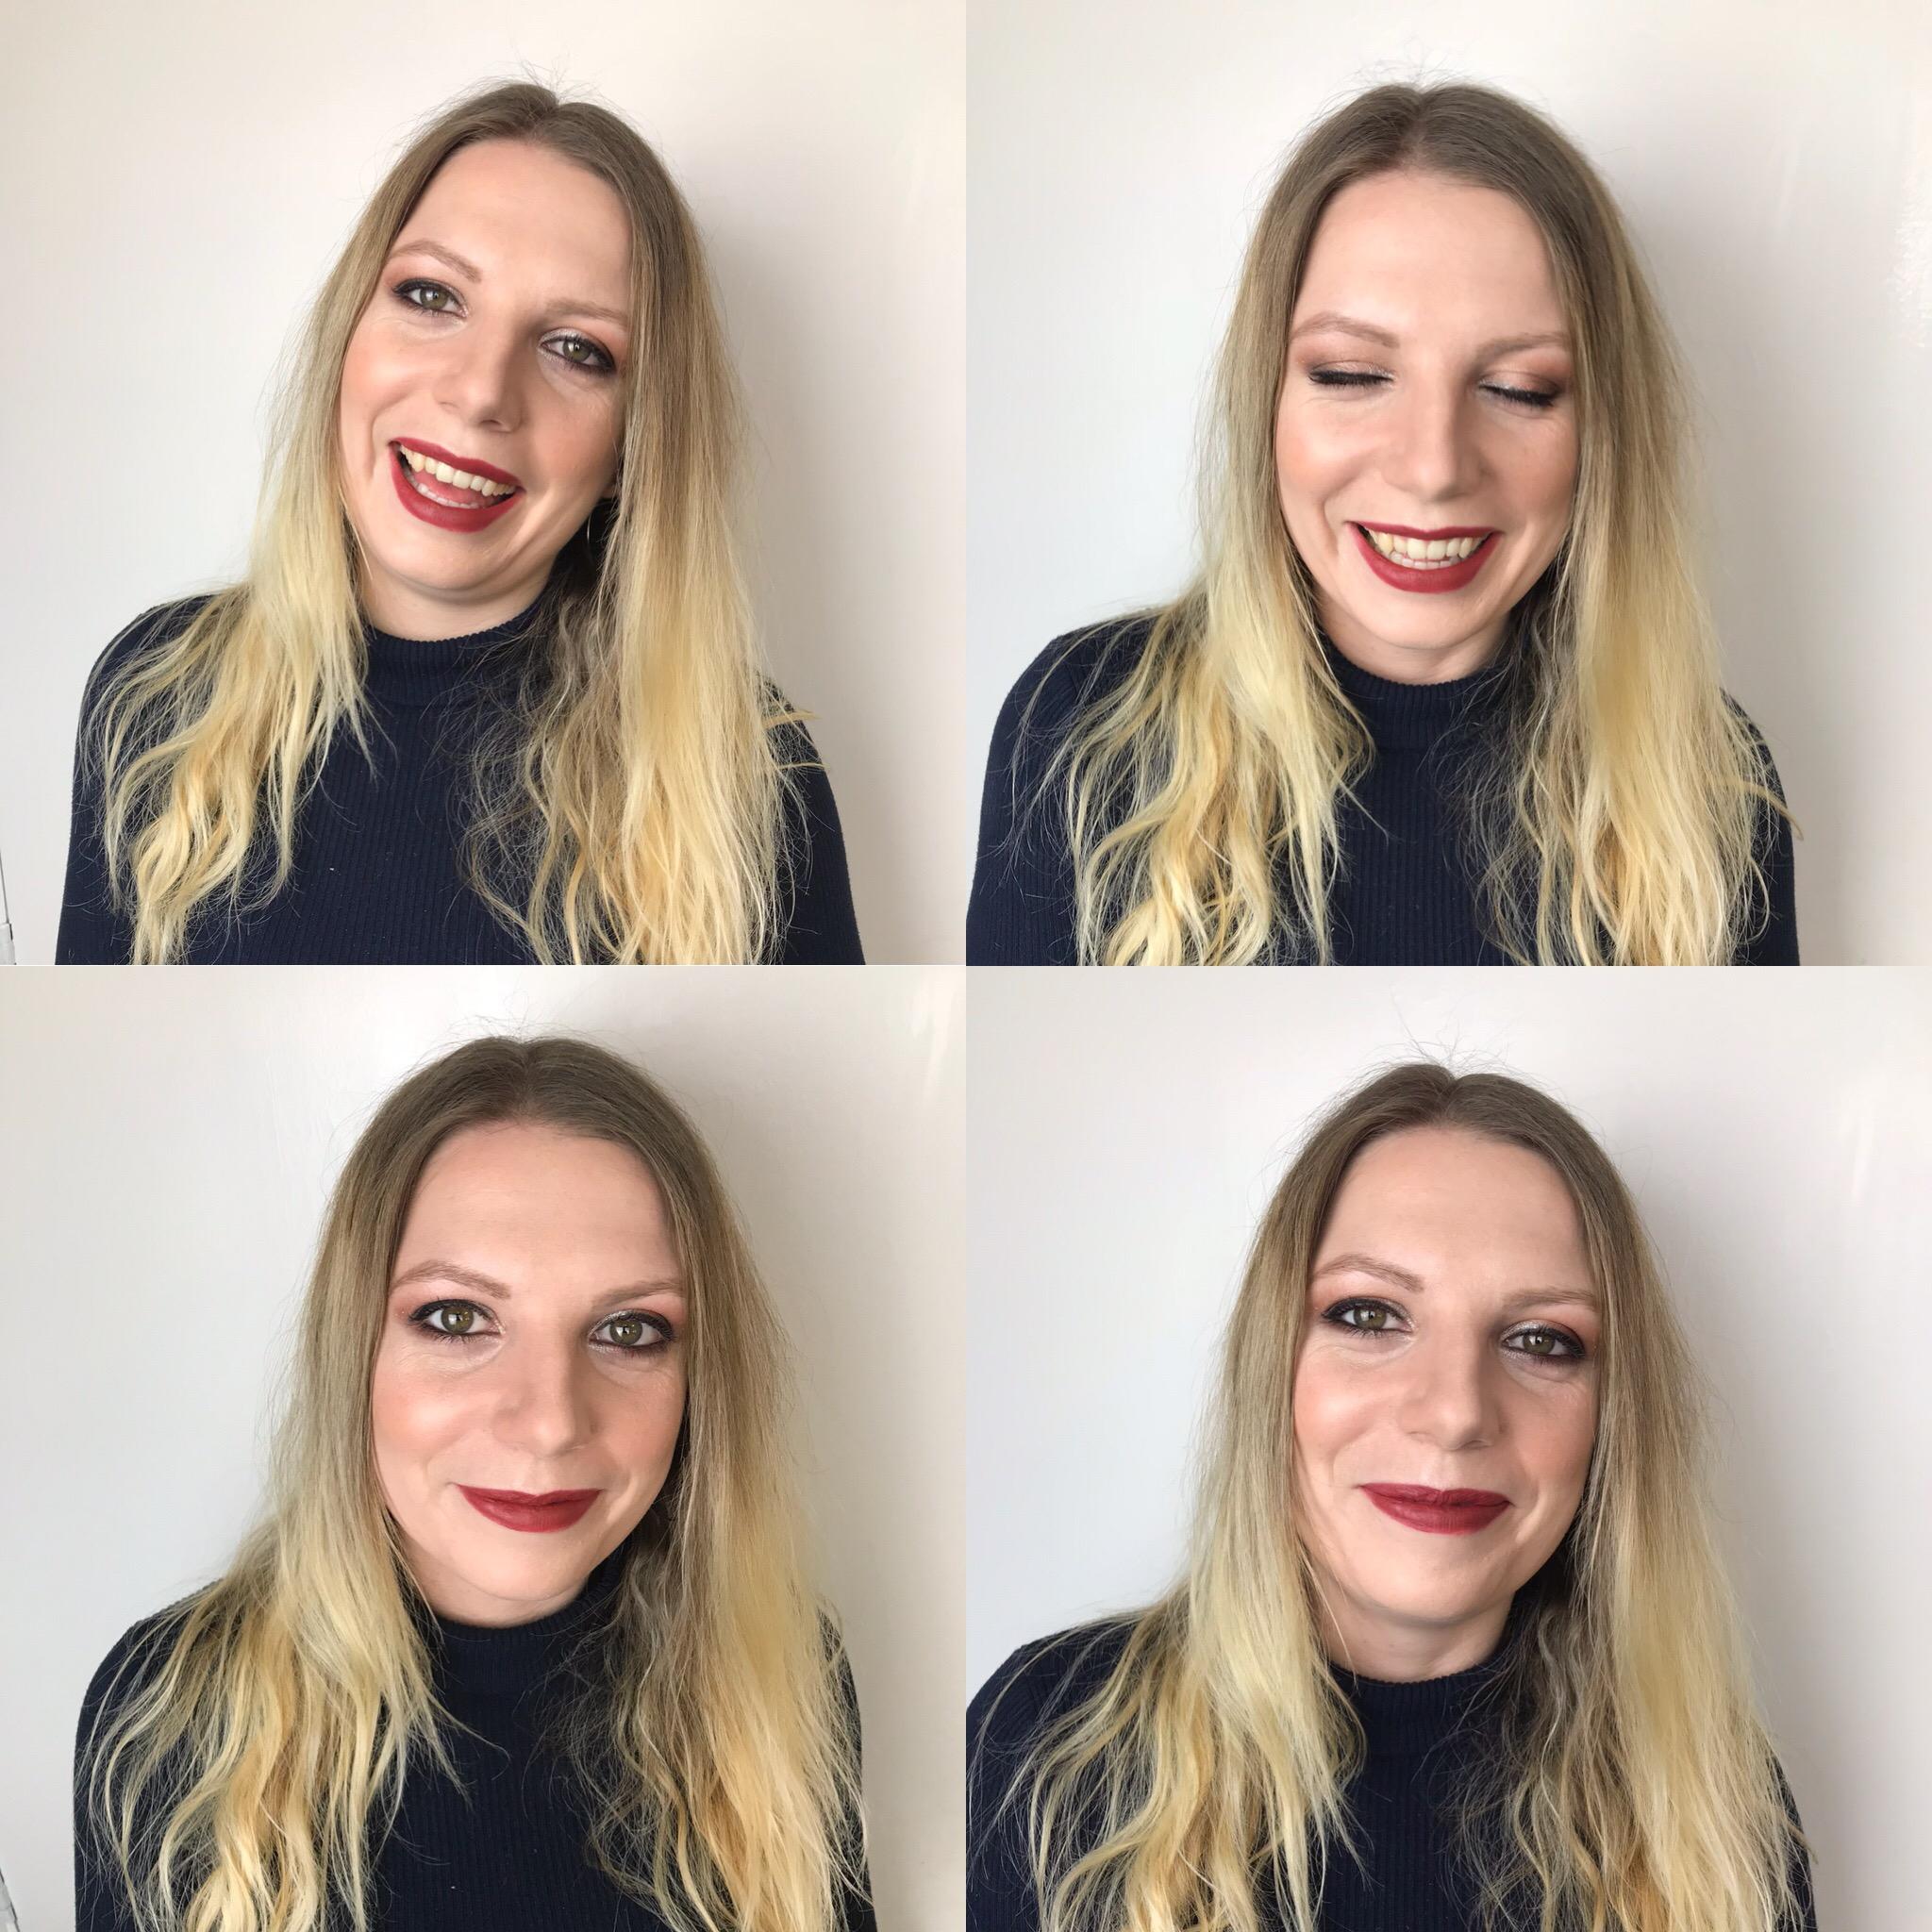 Makeup masterclass with Gemma